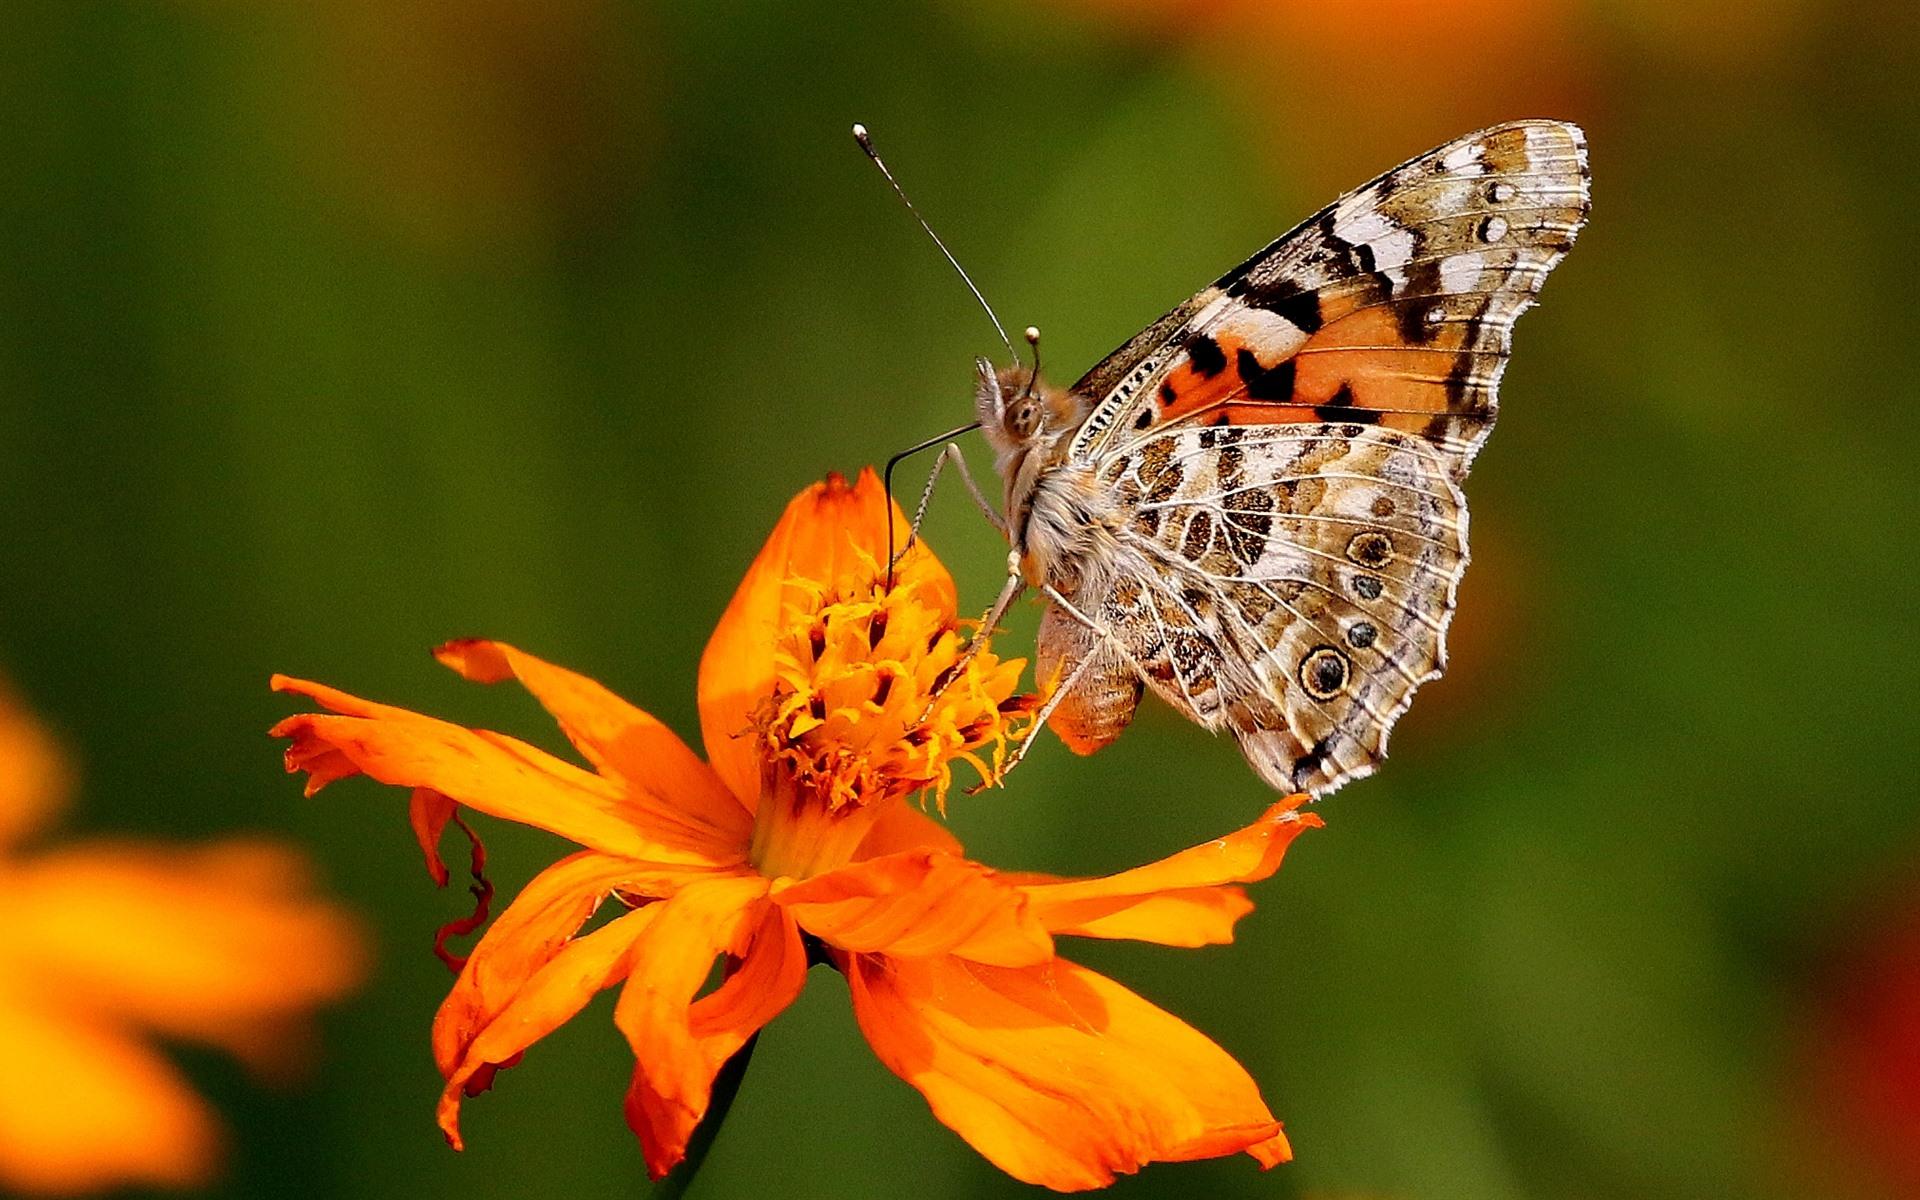 Wallpaper Orange flowers and butterfly 1920x1200 HD ...